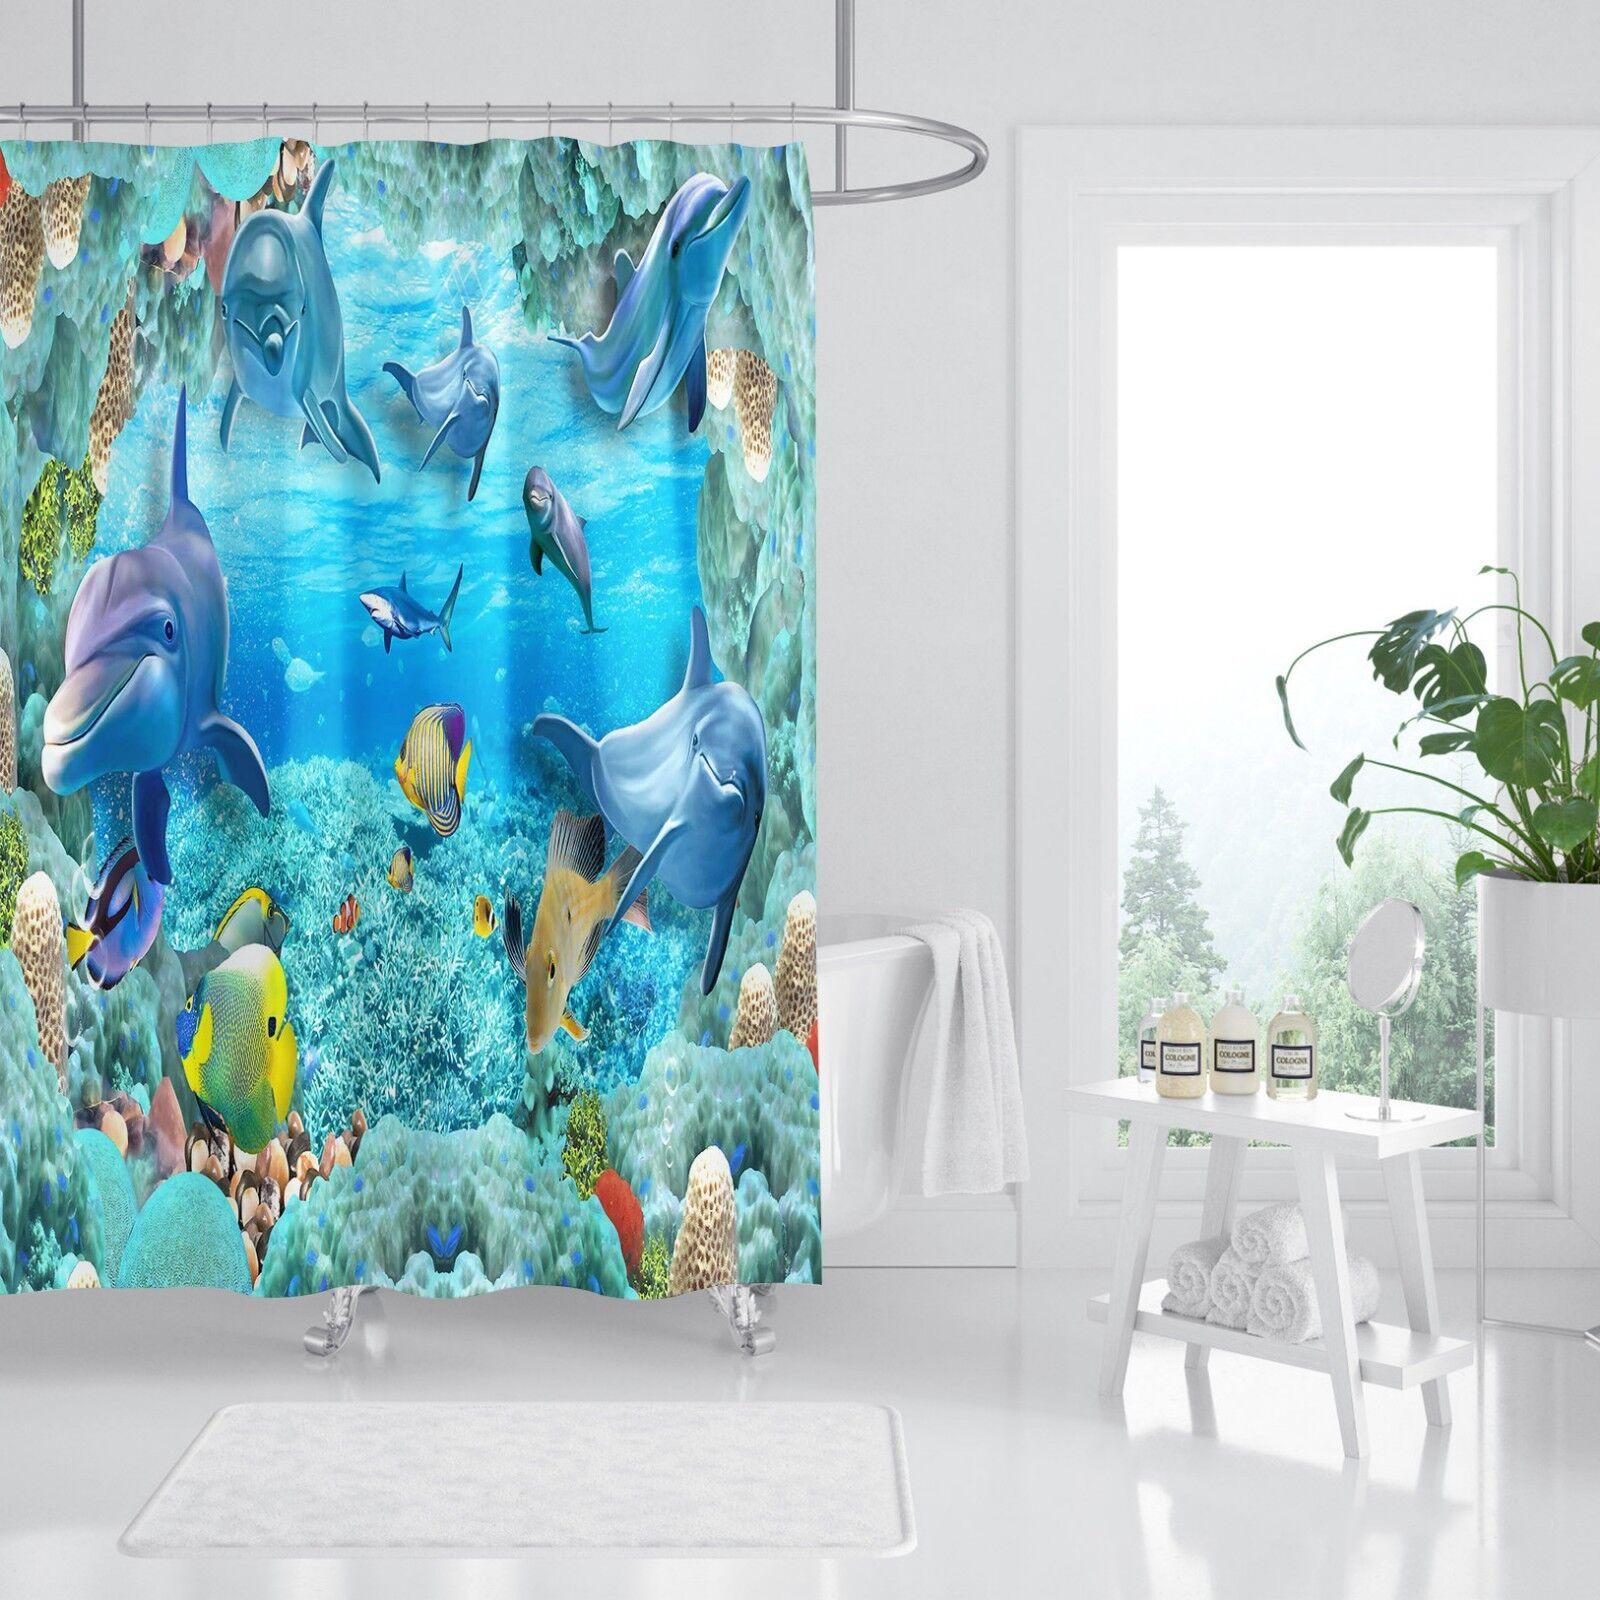 3D Meer Delphin 4 Duschvorhang Wasserdicht Faser Bad Bad Bad Daheim Windows Toilette DE | Bestellung willkommen  d35ef1